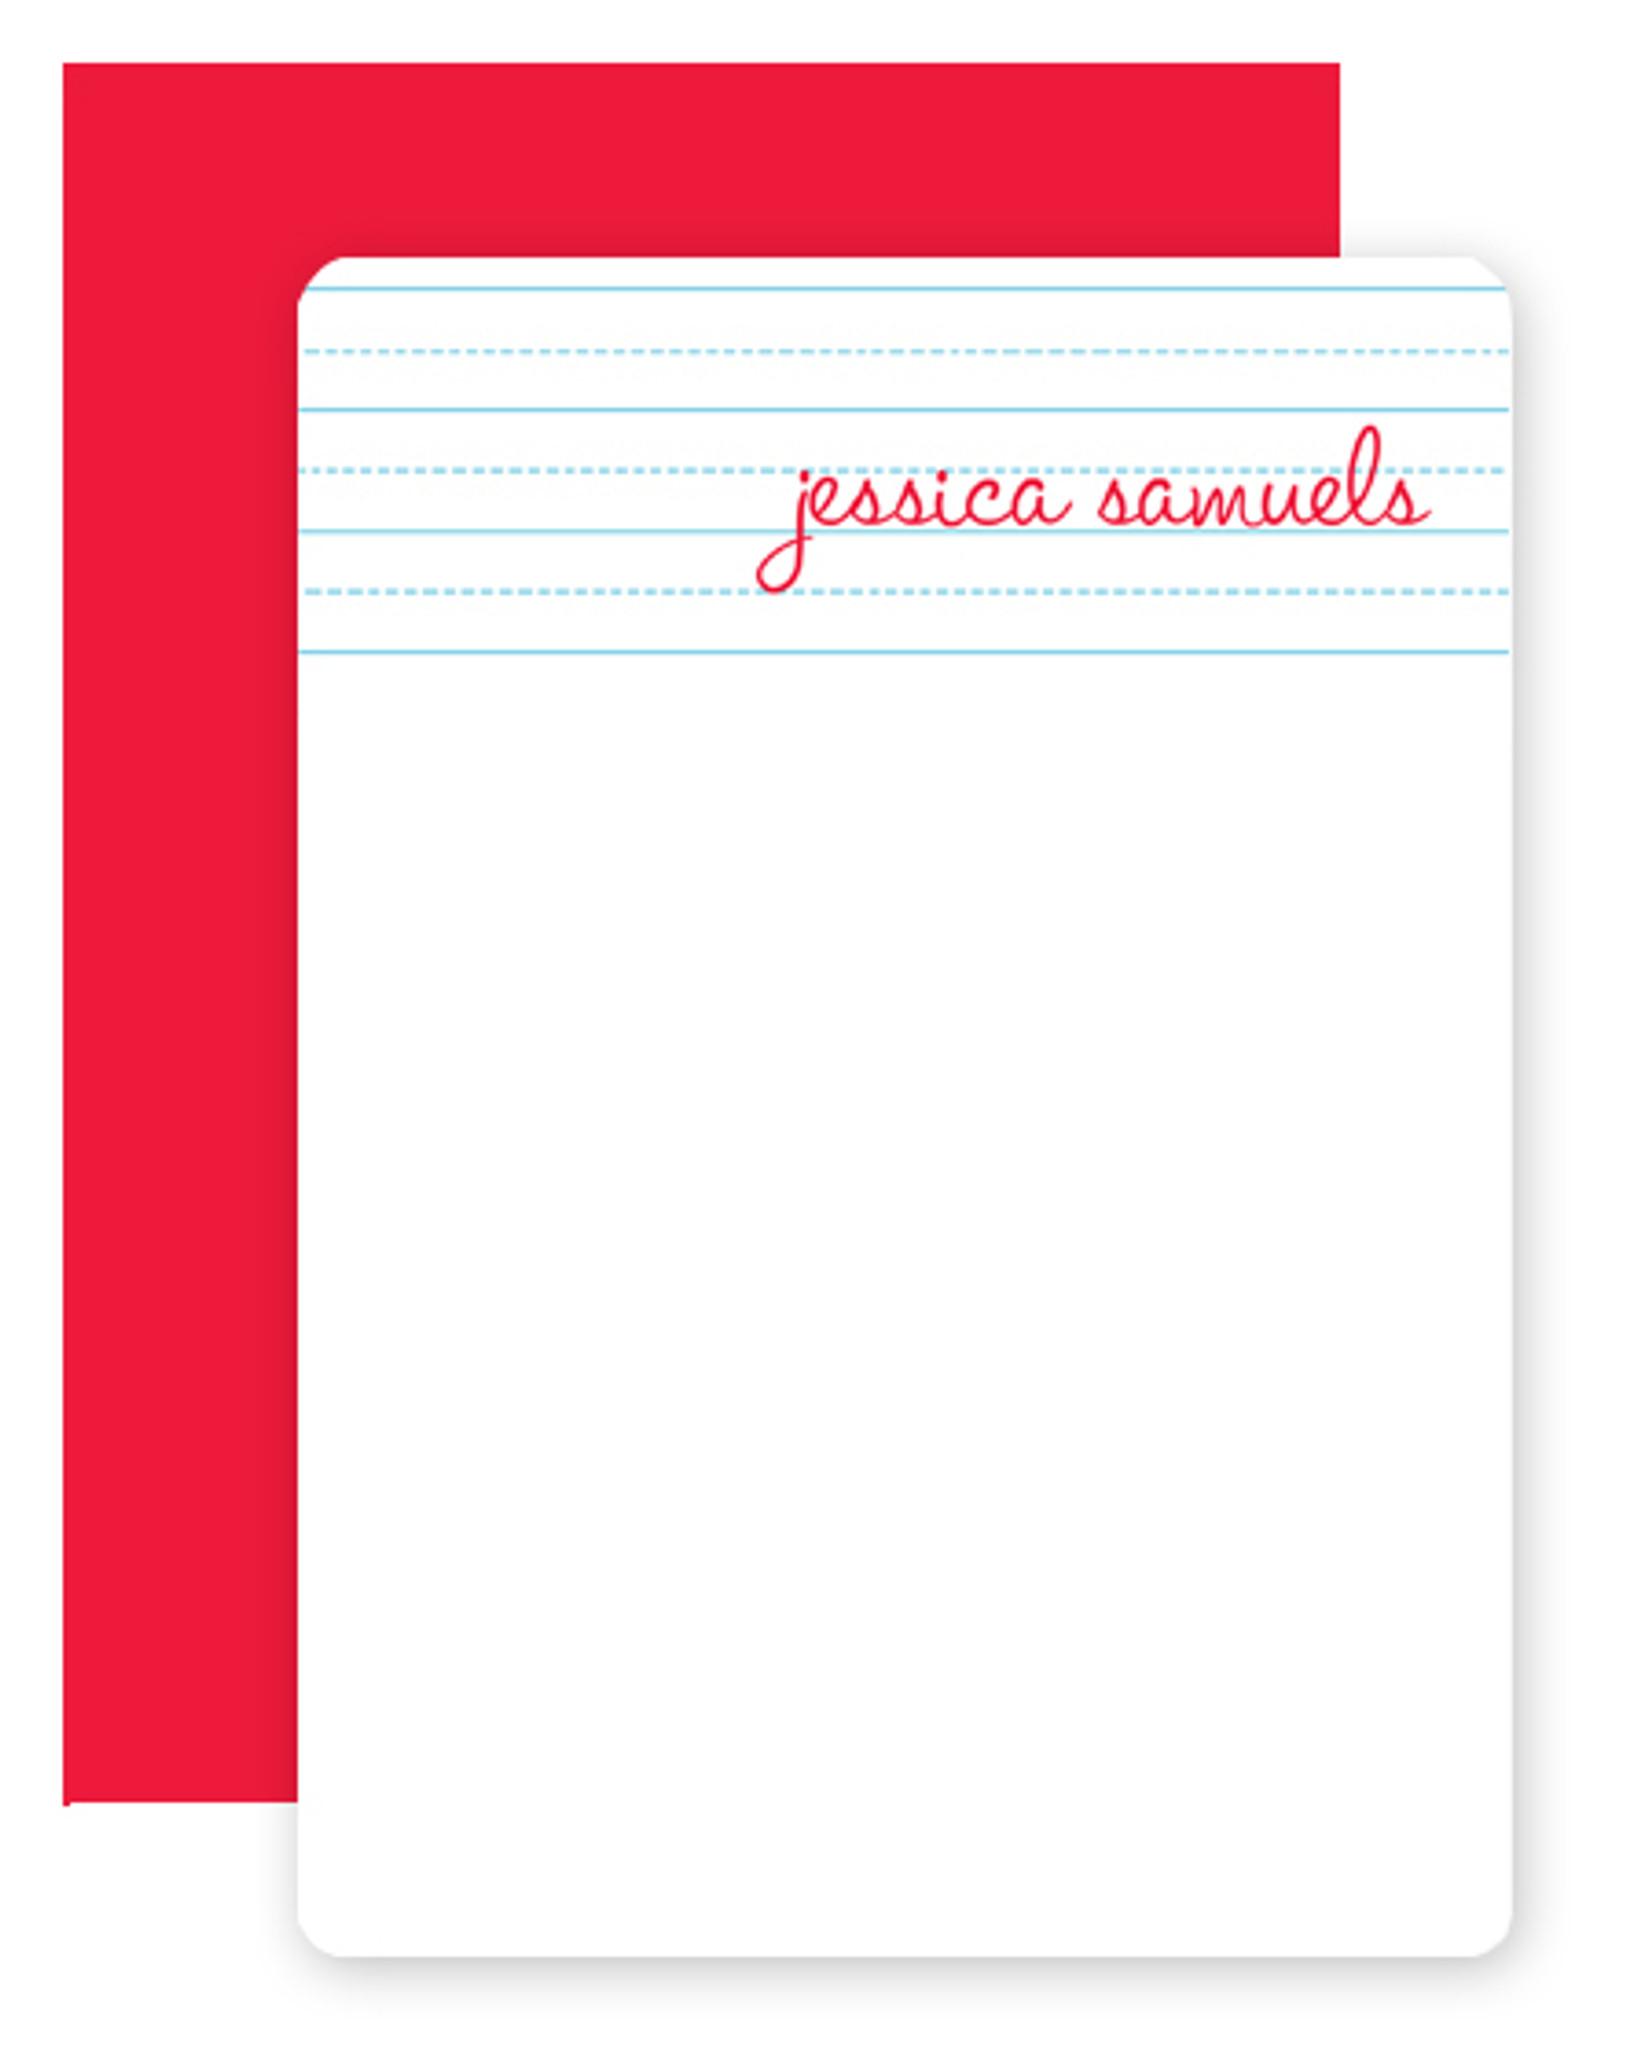 Cursive Personalized Stationery